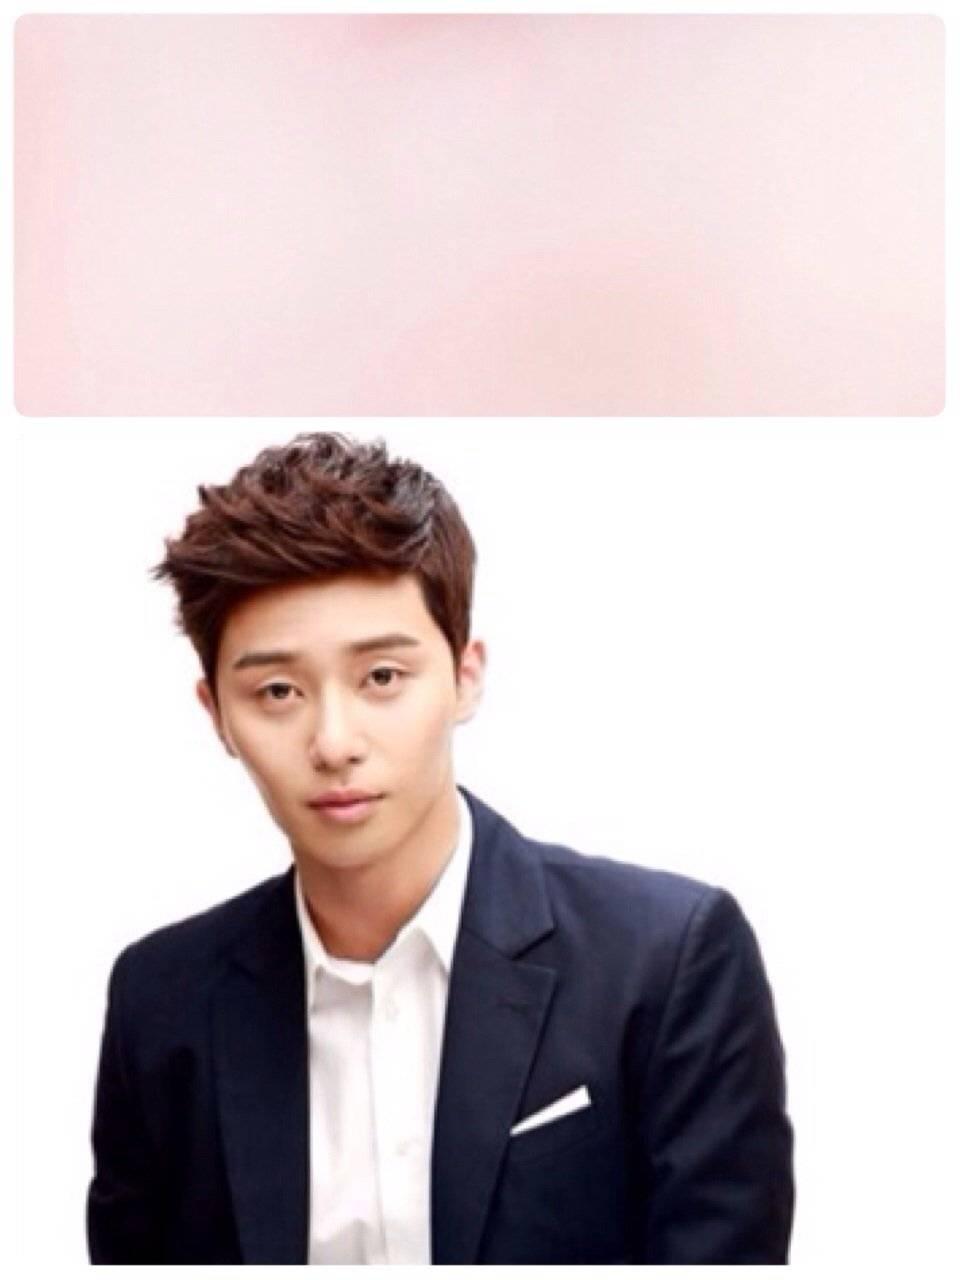 Park Seo Joon 박서준 Picture Gallery Hancinema The